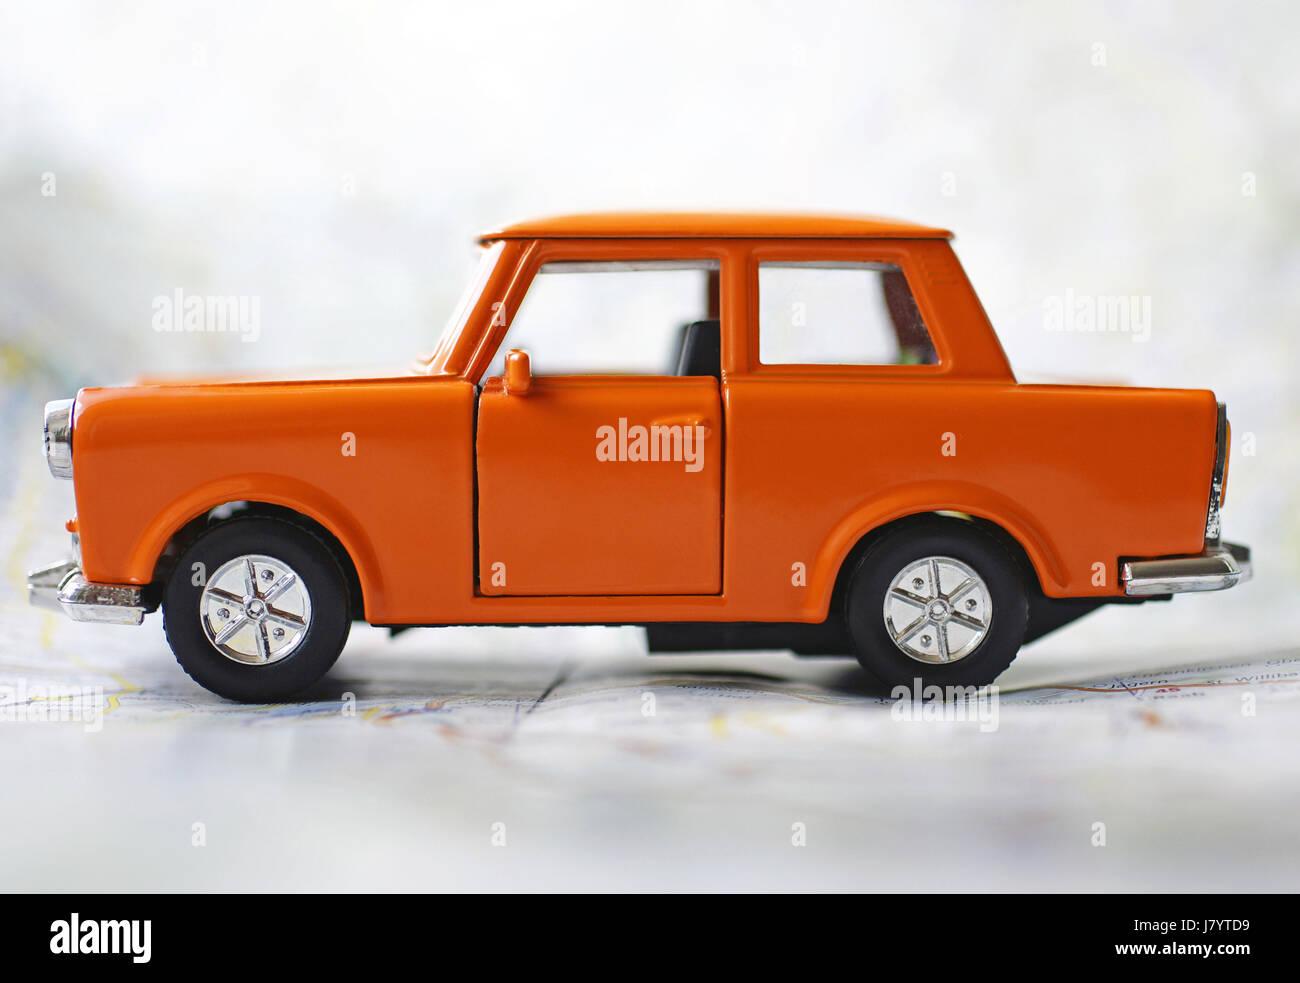 Stoßstange Stockfotos & Stoßstange Bilder - Alamy